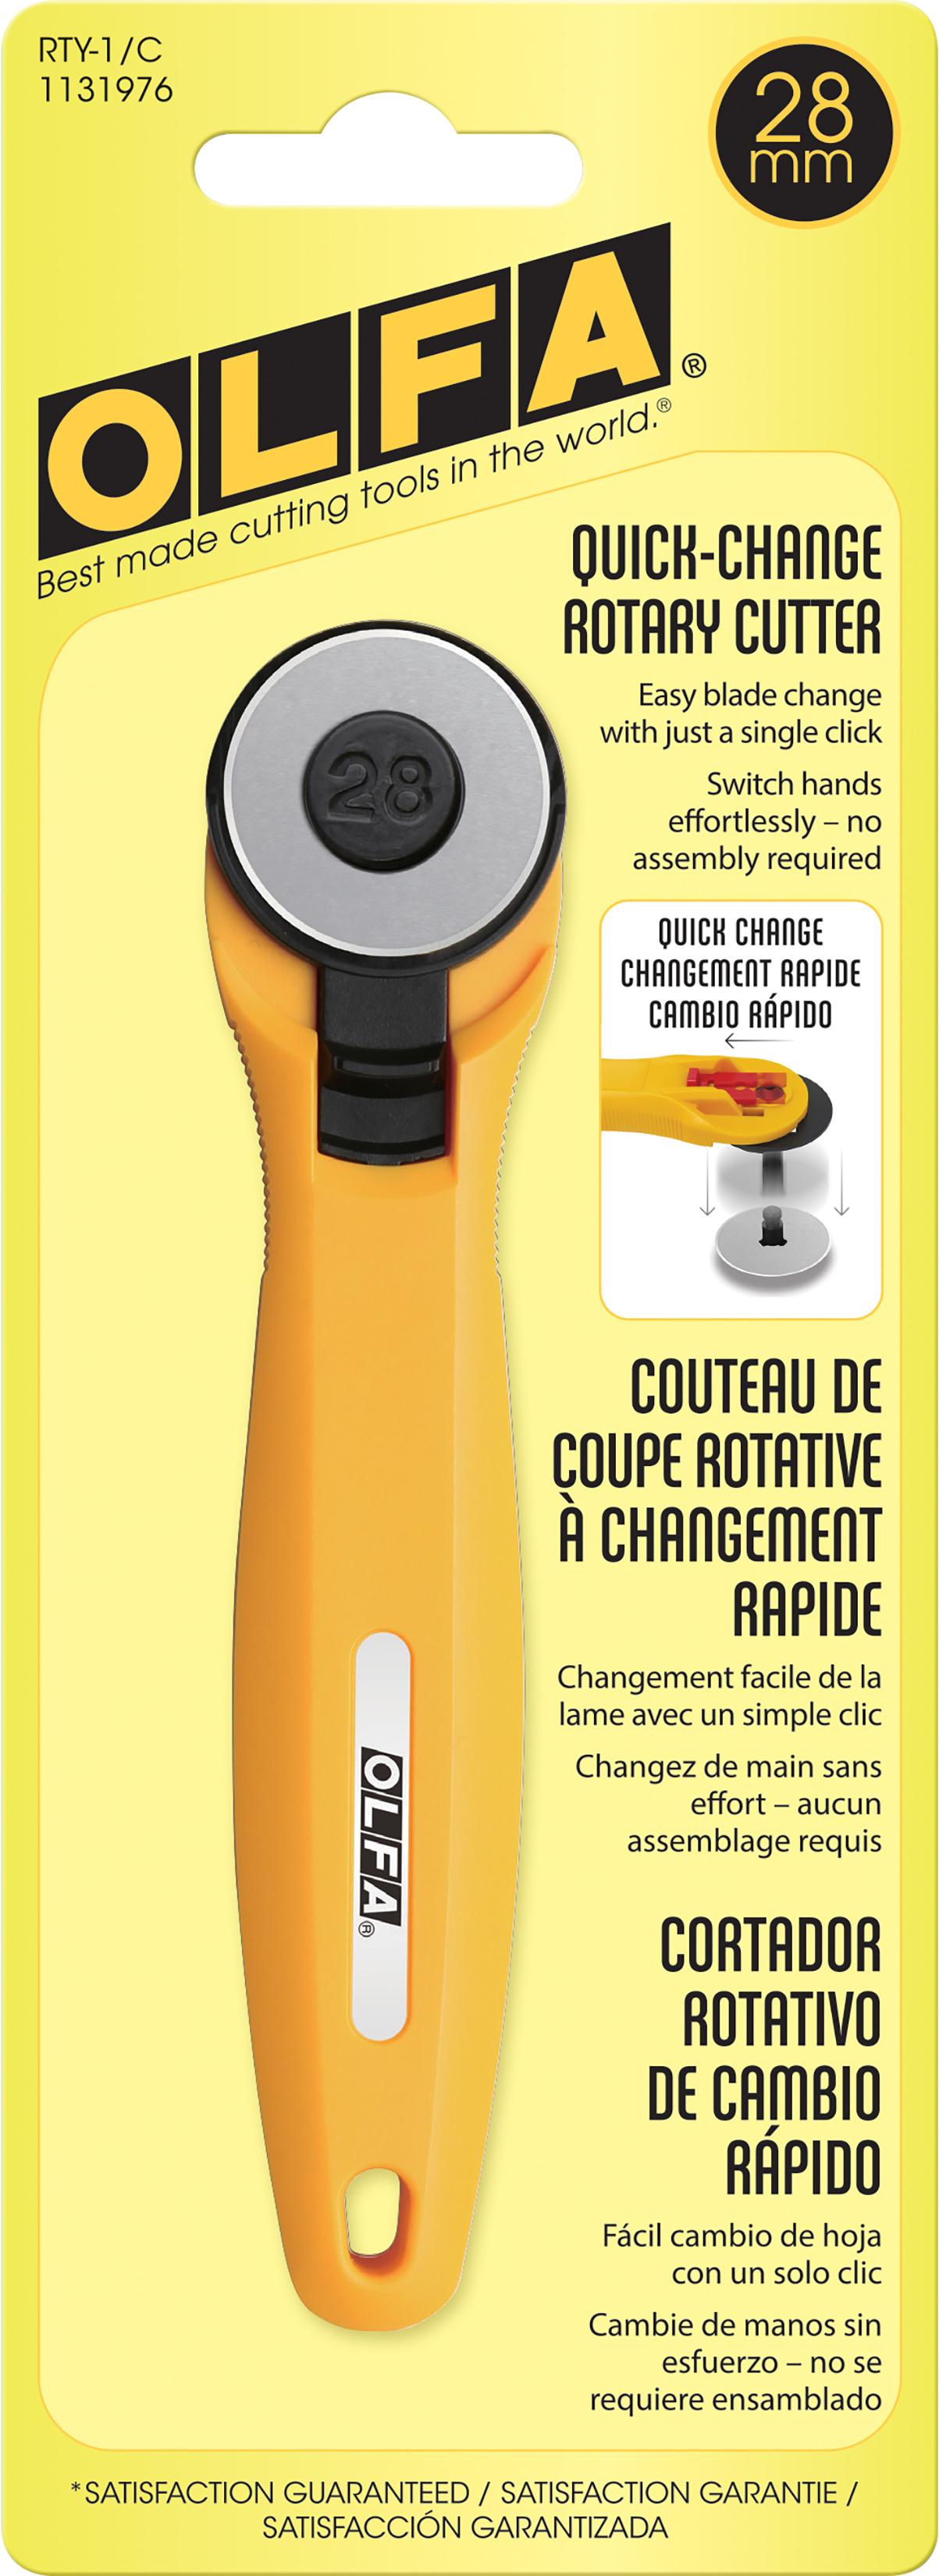 OLFA Standard Rotary Cutter 28mm-